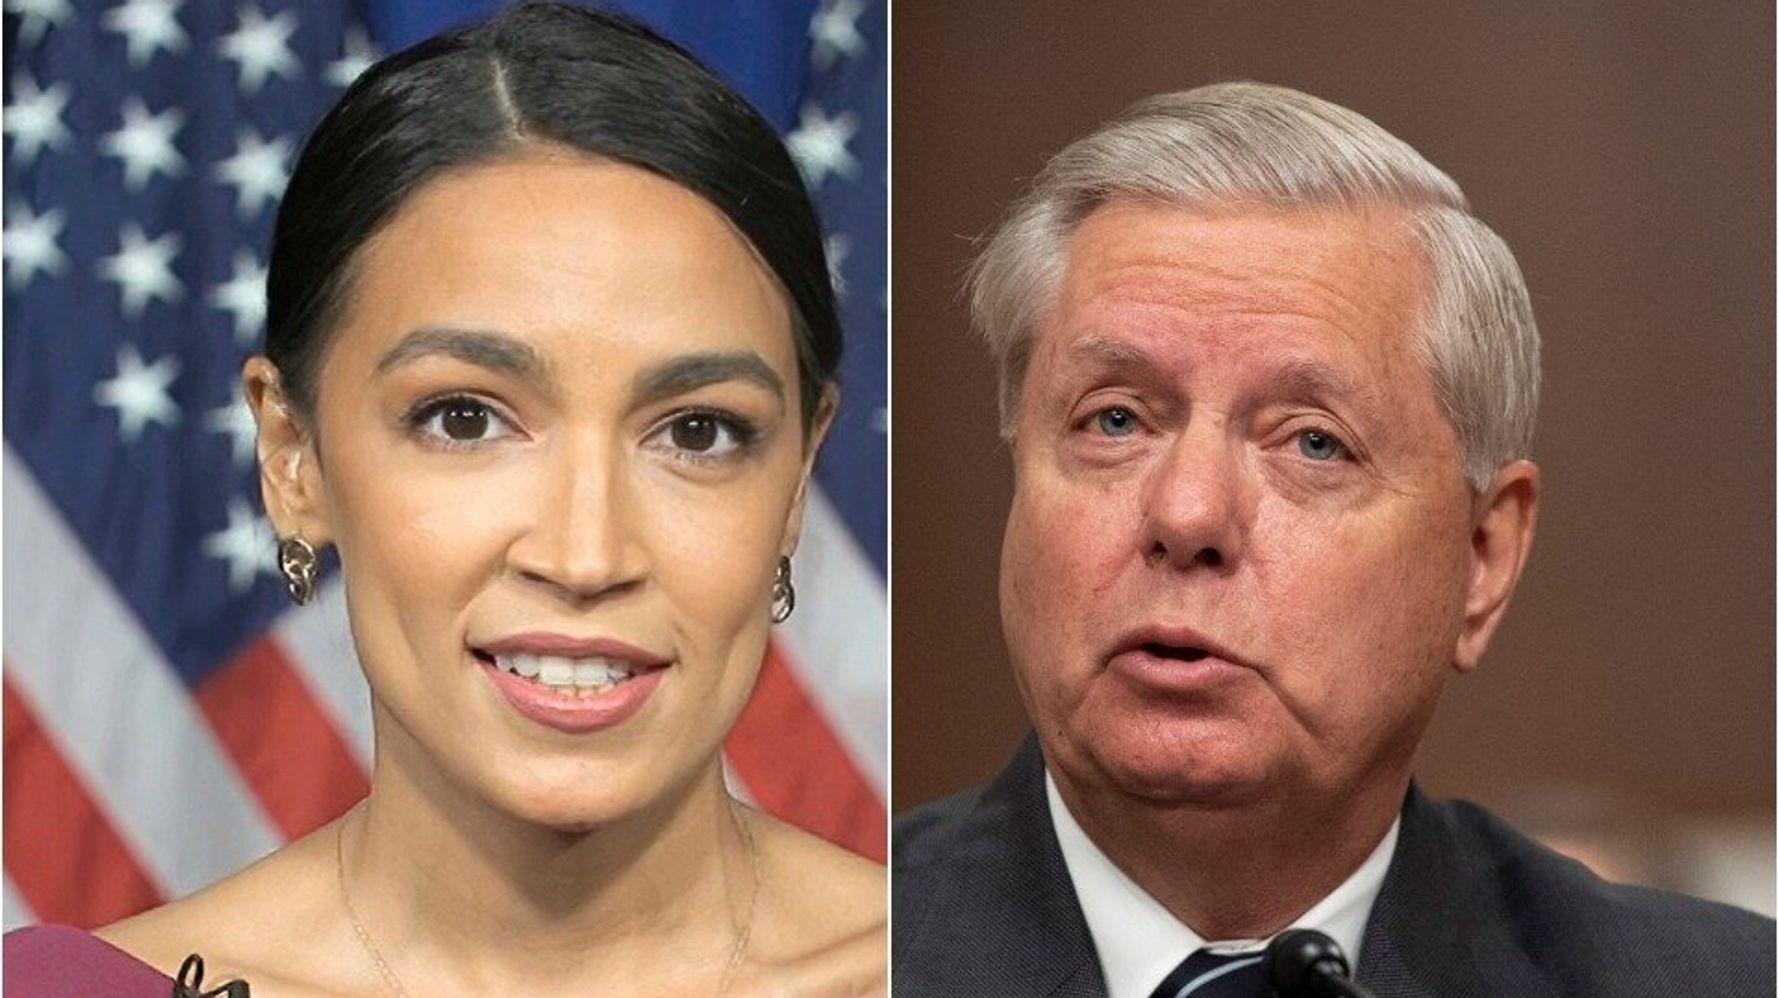 Alexandria Ocasio-Cortez Slams 'Spinelessness' Of Trump Acolyte Lindsey Graham